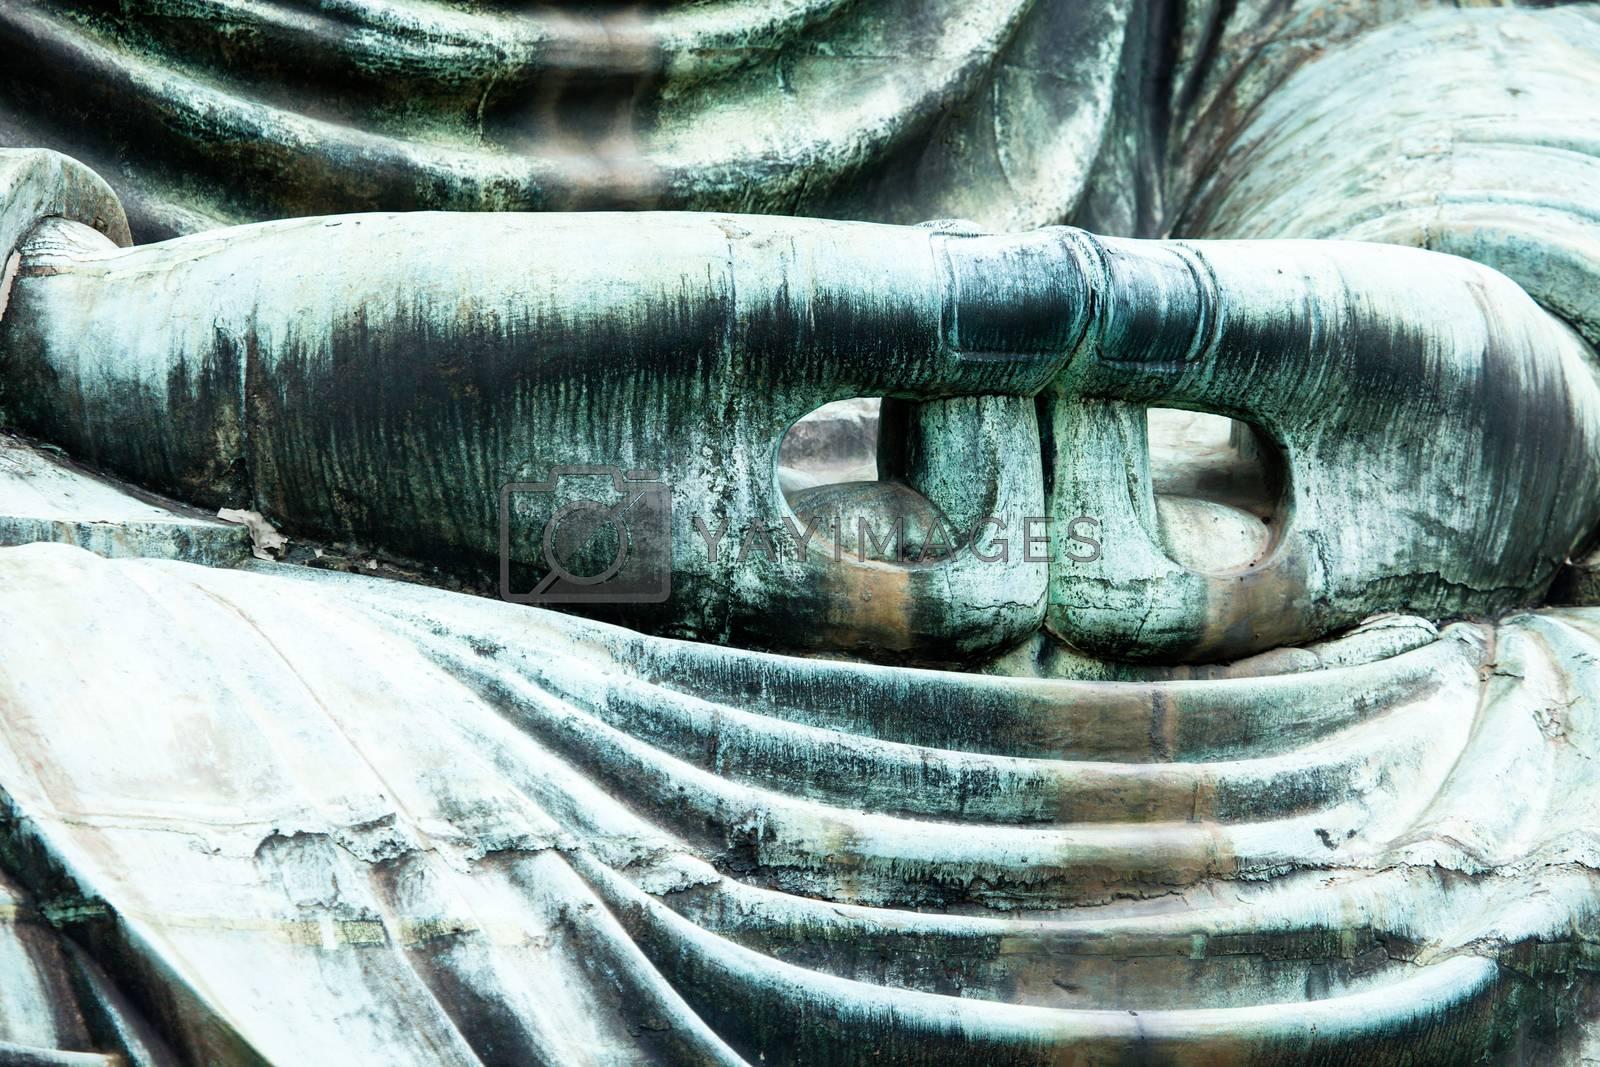 The Great Buddha (Daibutsu) on the grounds of Kotokuin Temple in Kamakura, Japan.